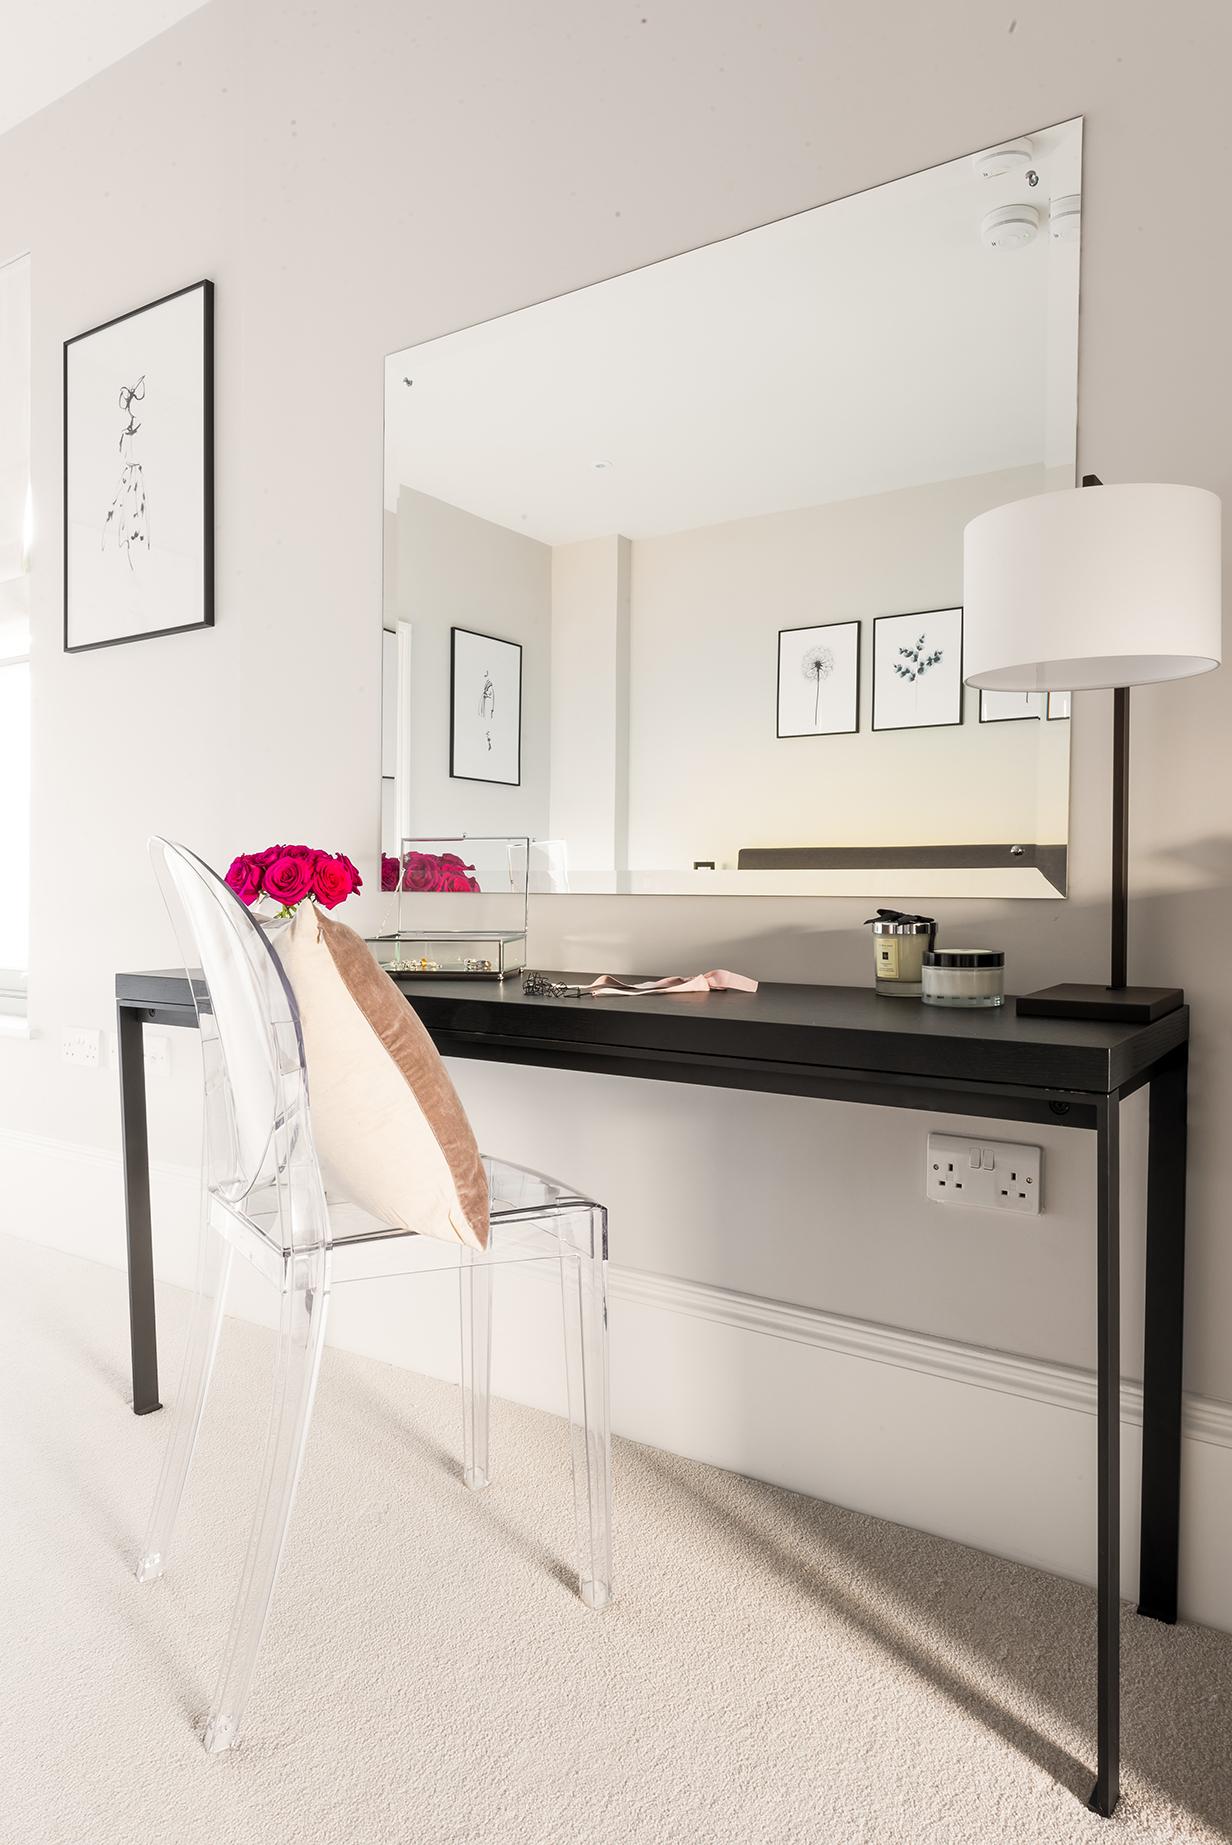 Fiona Brass Interiors - Crown House-8.jpg